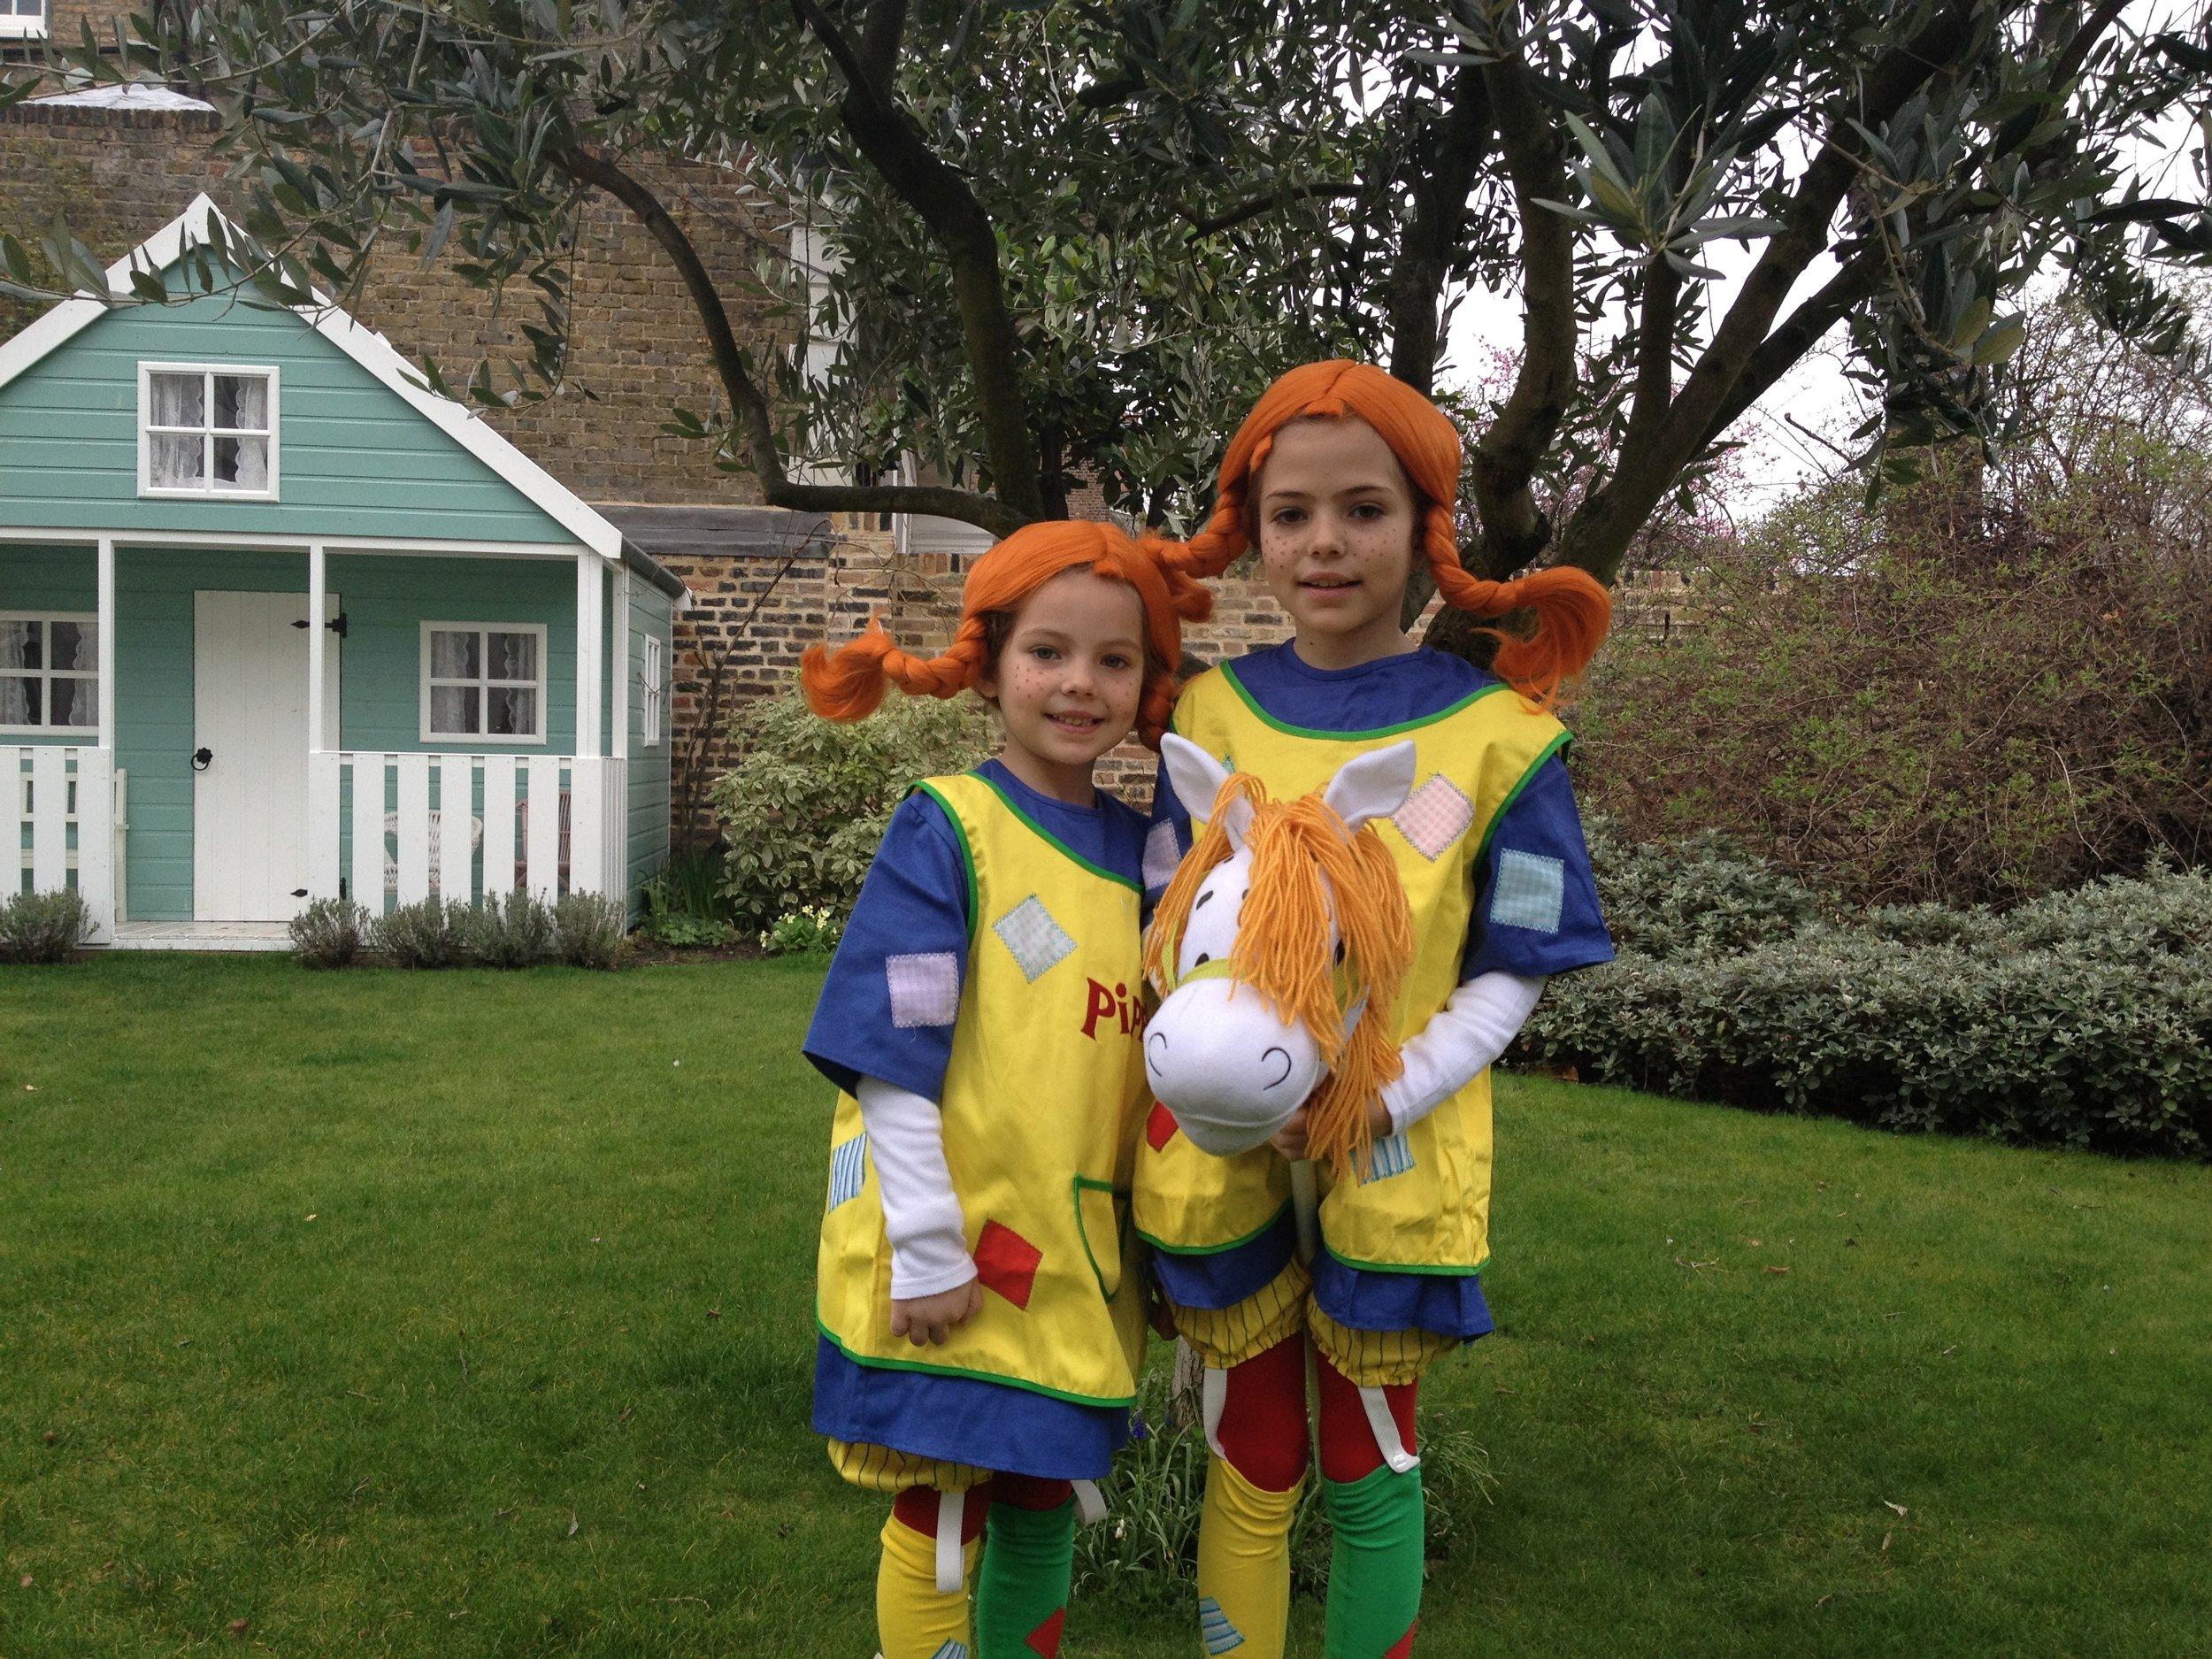 Pippi Longstockings Halloween Costume Ideas